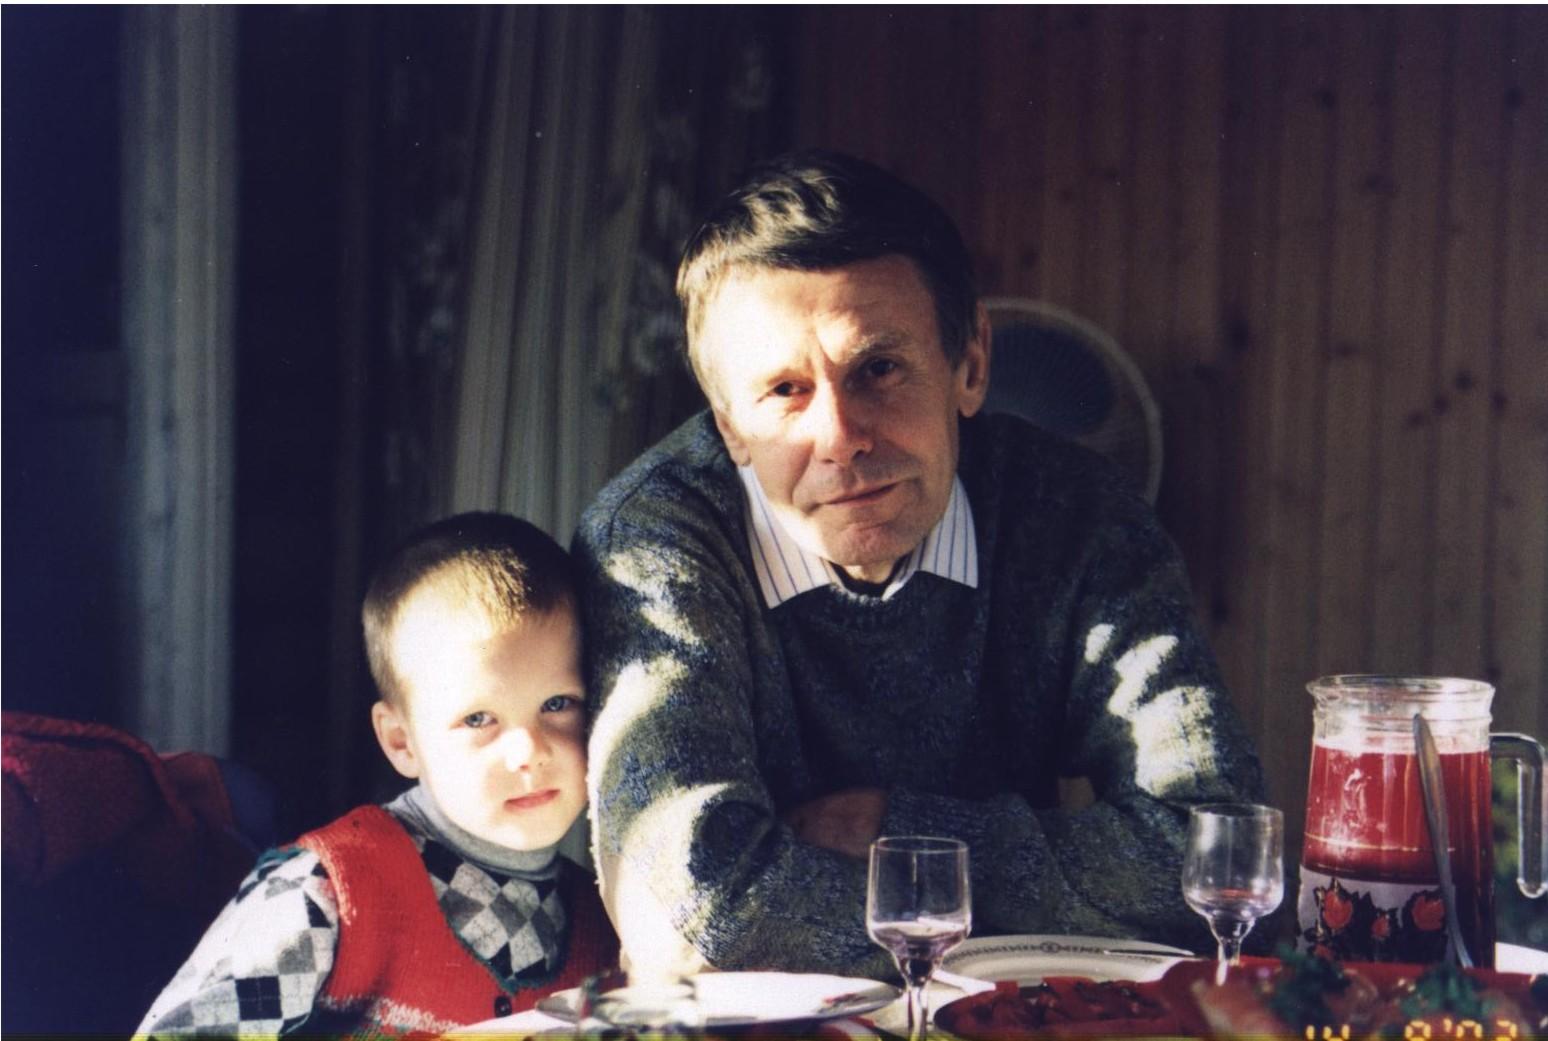 ded-sovratil-vnuchku